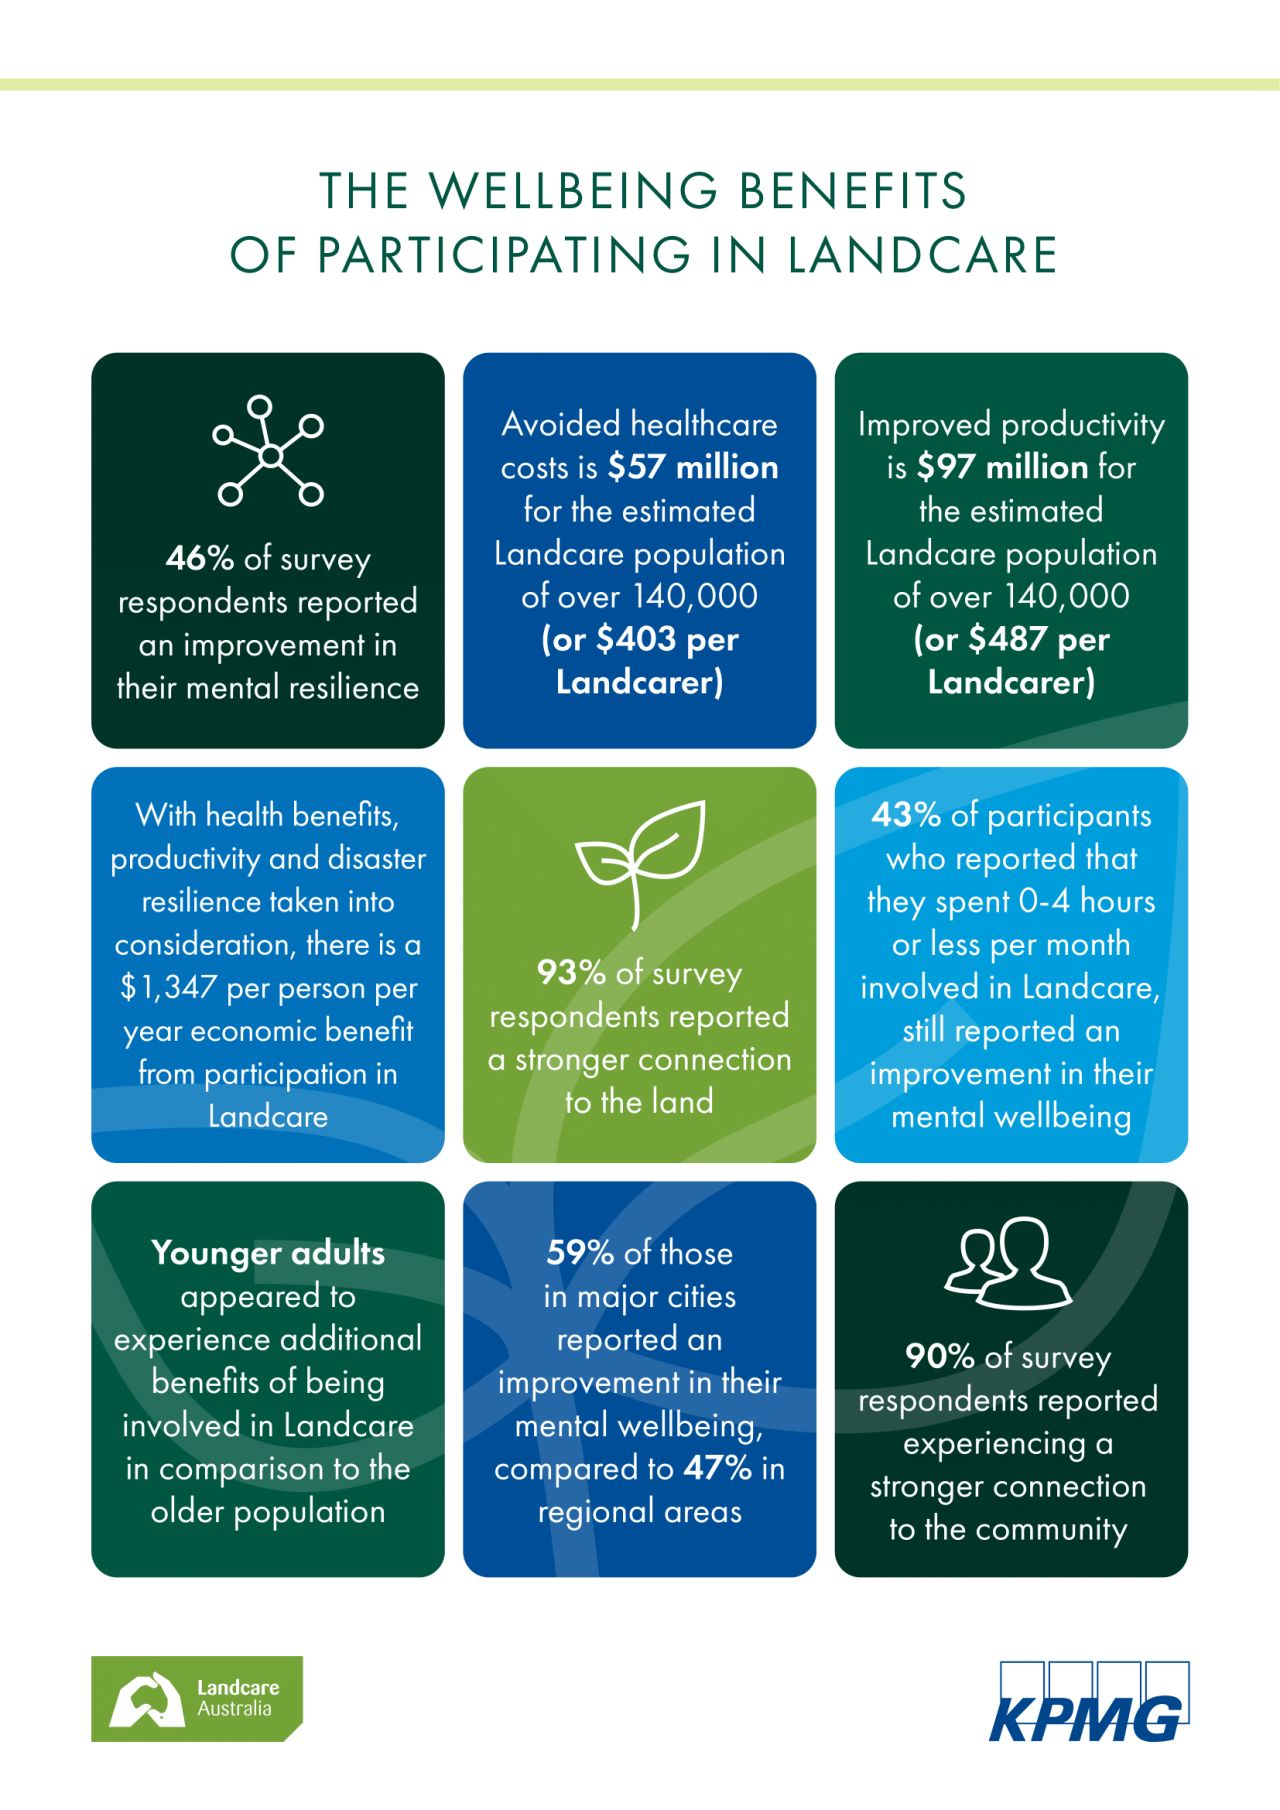 2021 KPMG / Landcare Australia